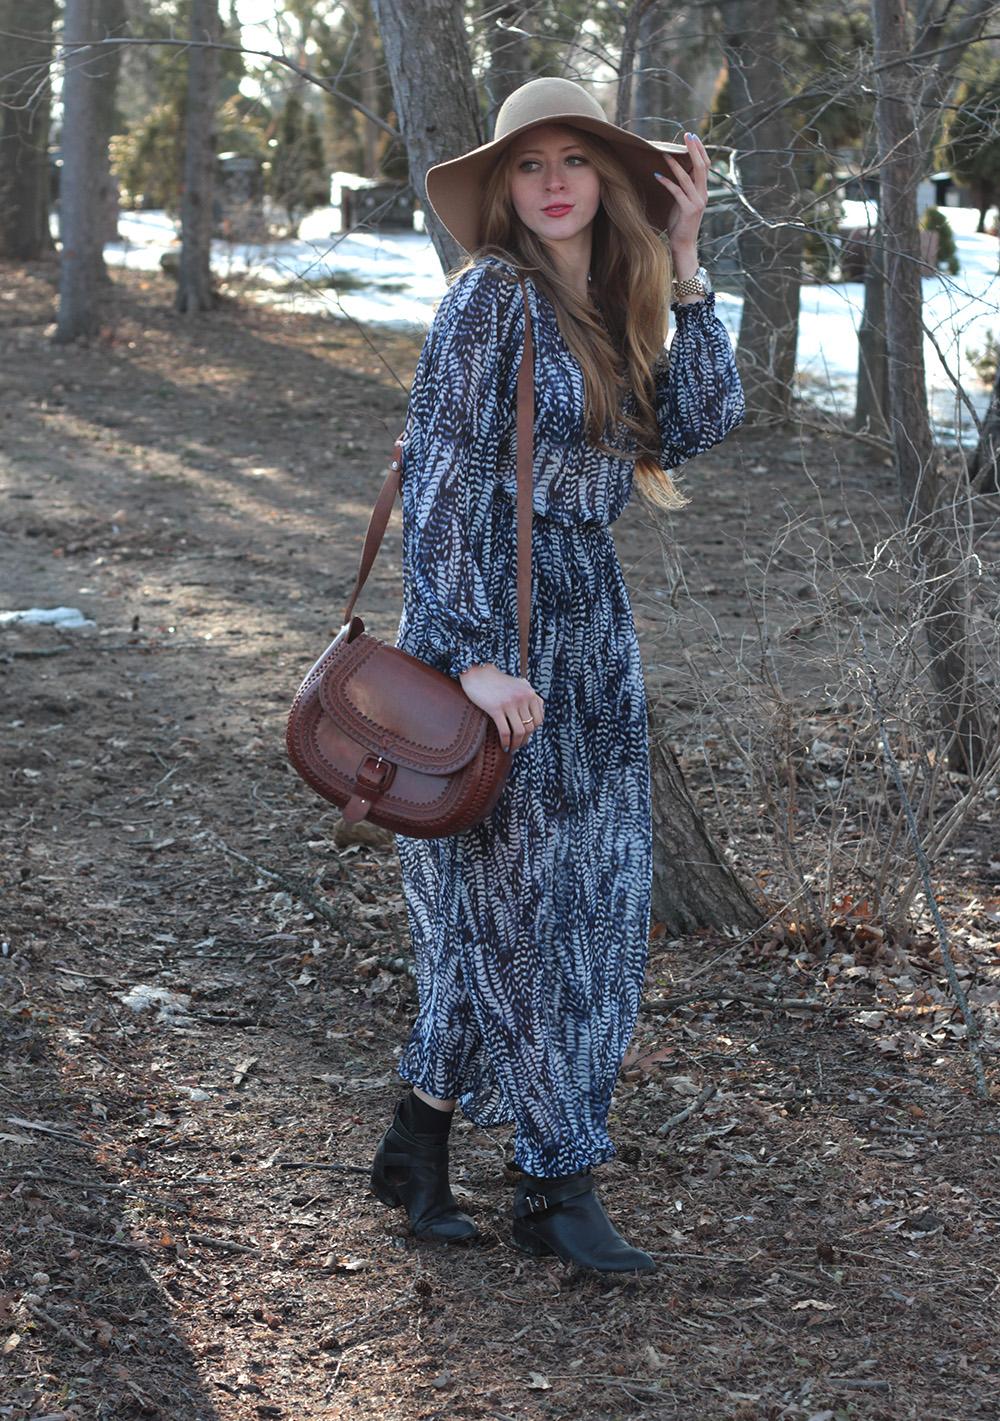 bohemian dress from h&m